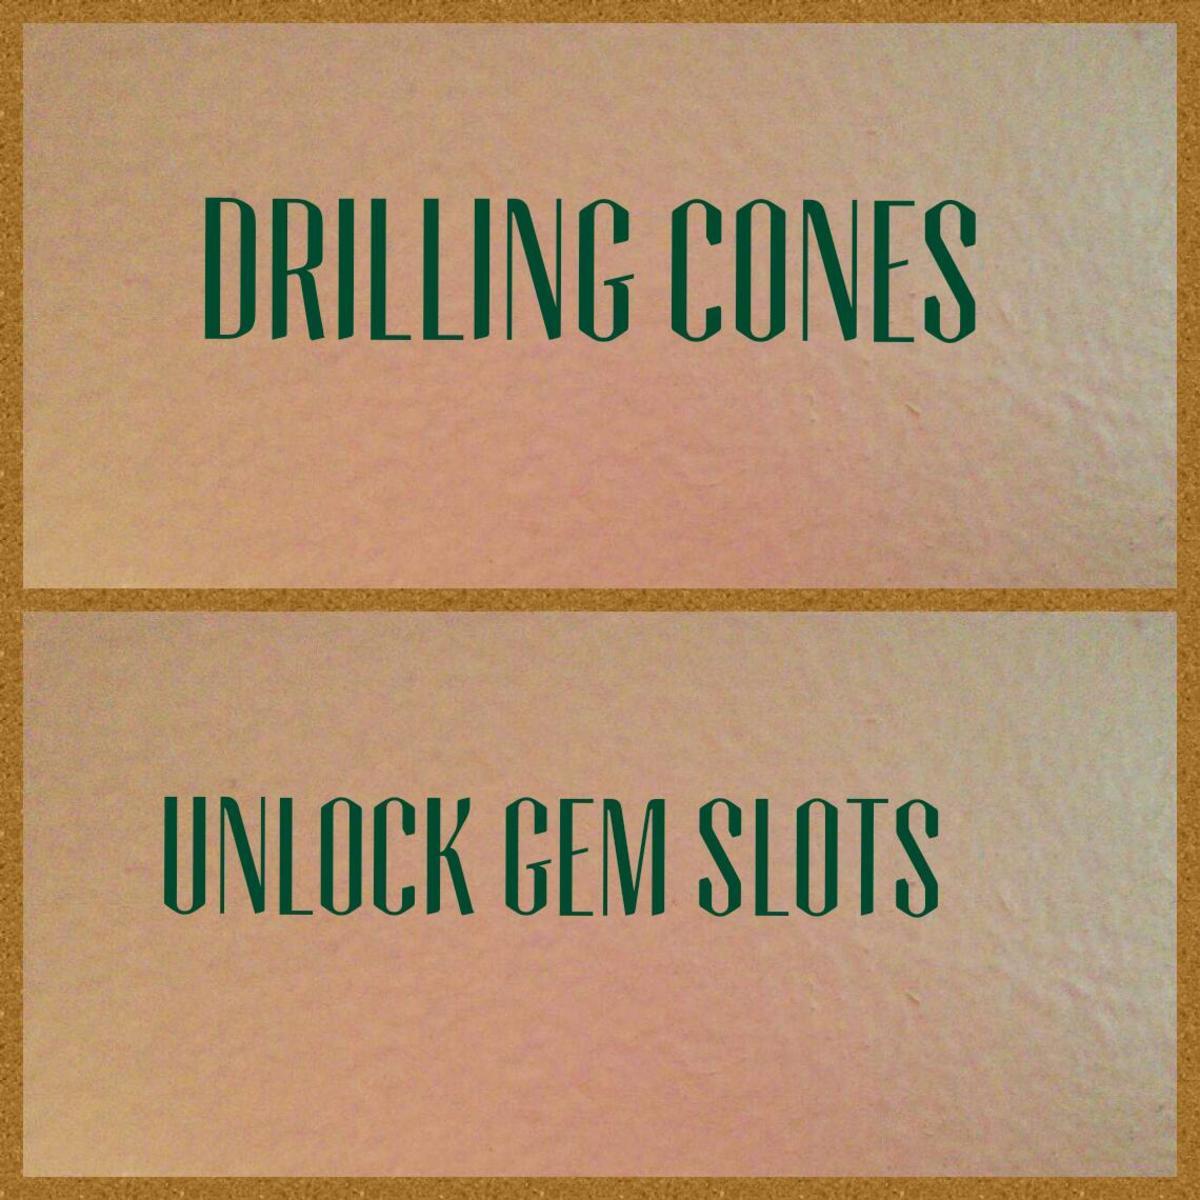 Use drilling cones to unlock gem slots.